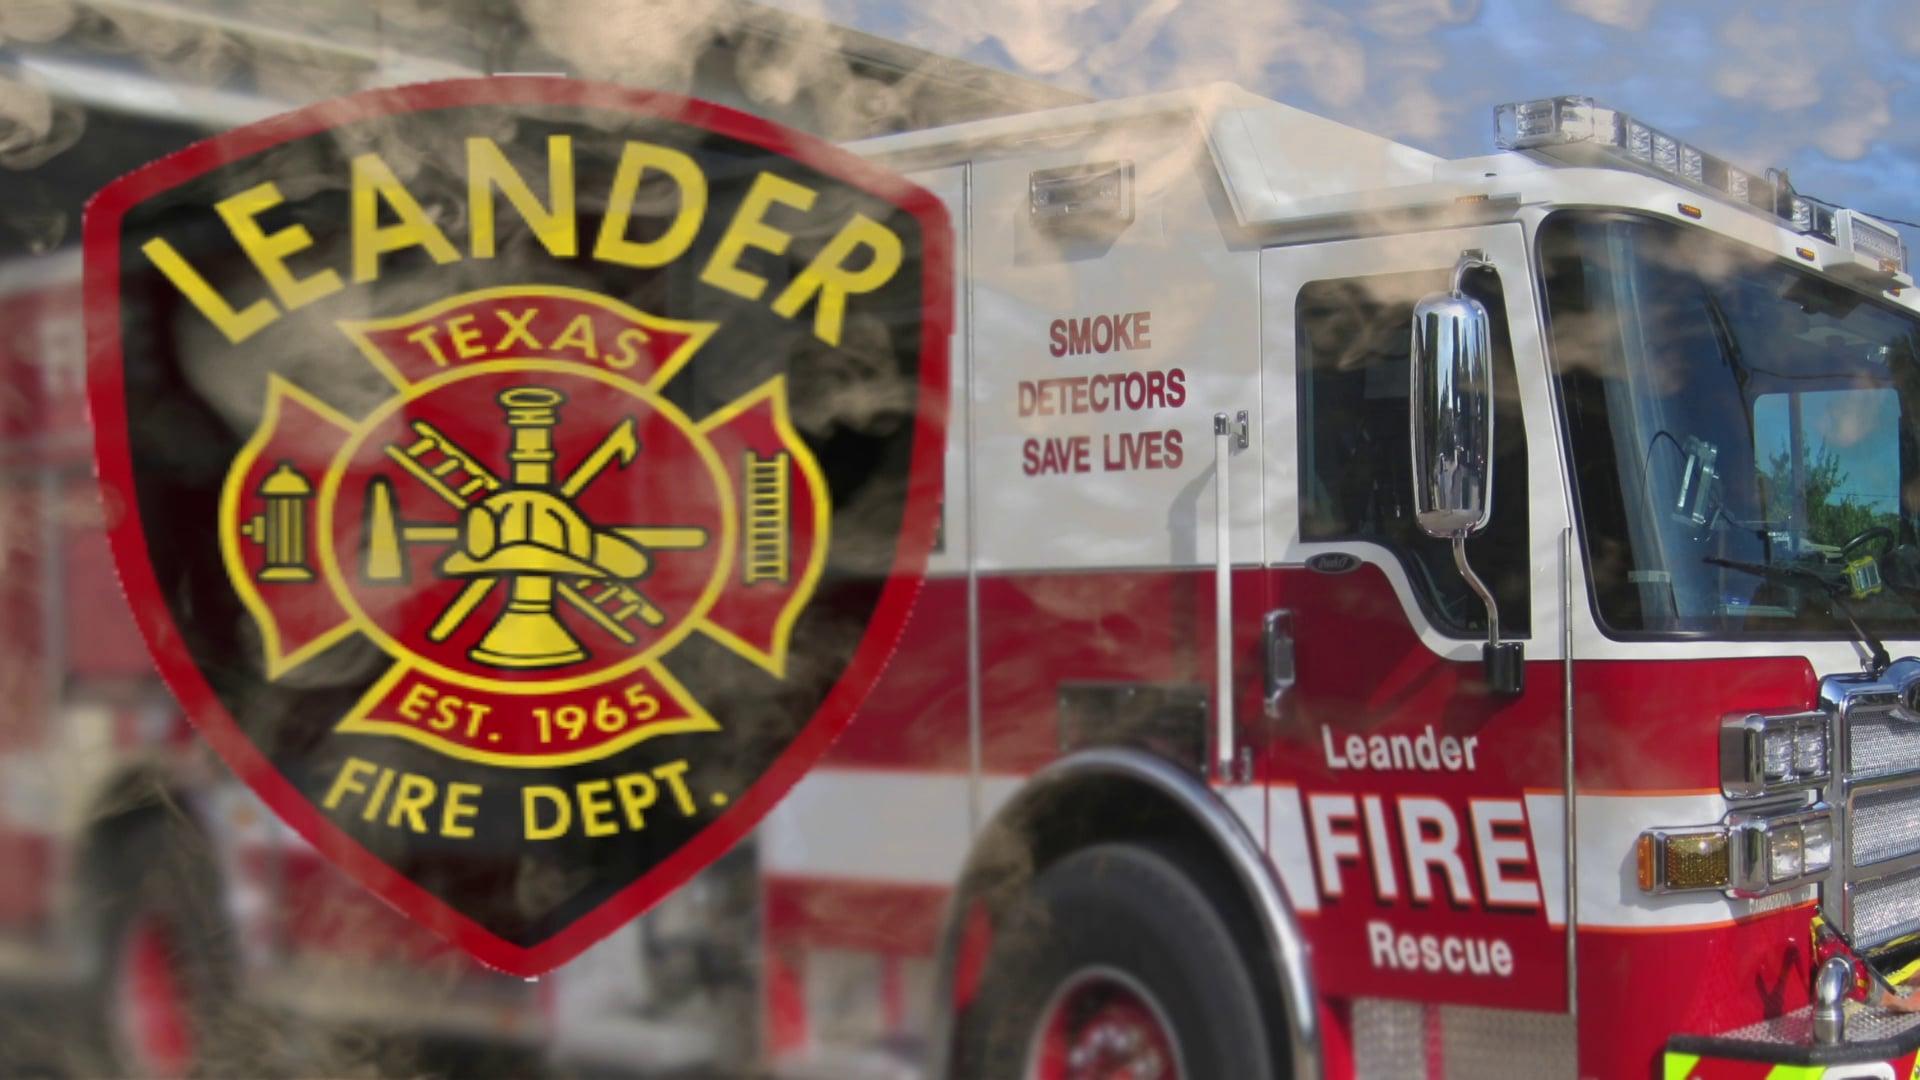 Leander Fire Department Smoke Detector PSA